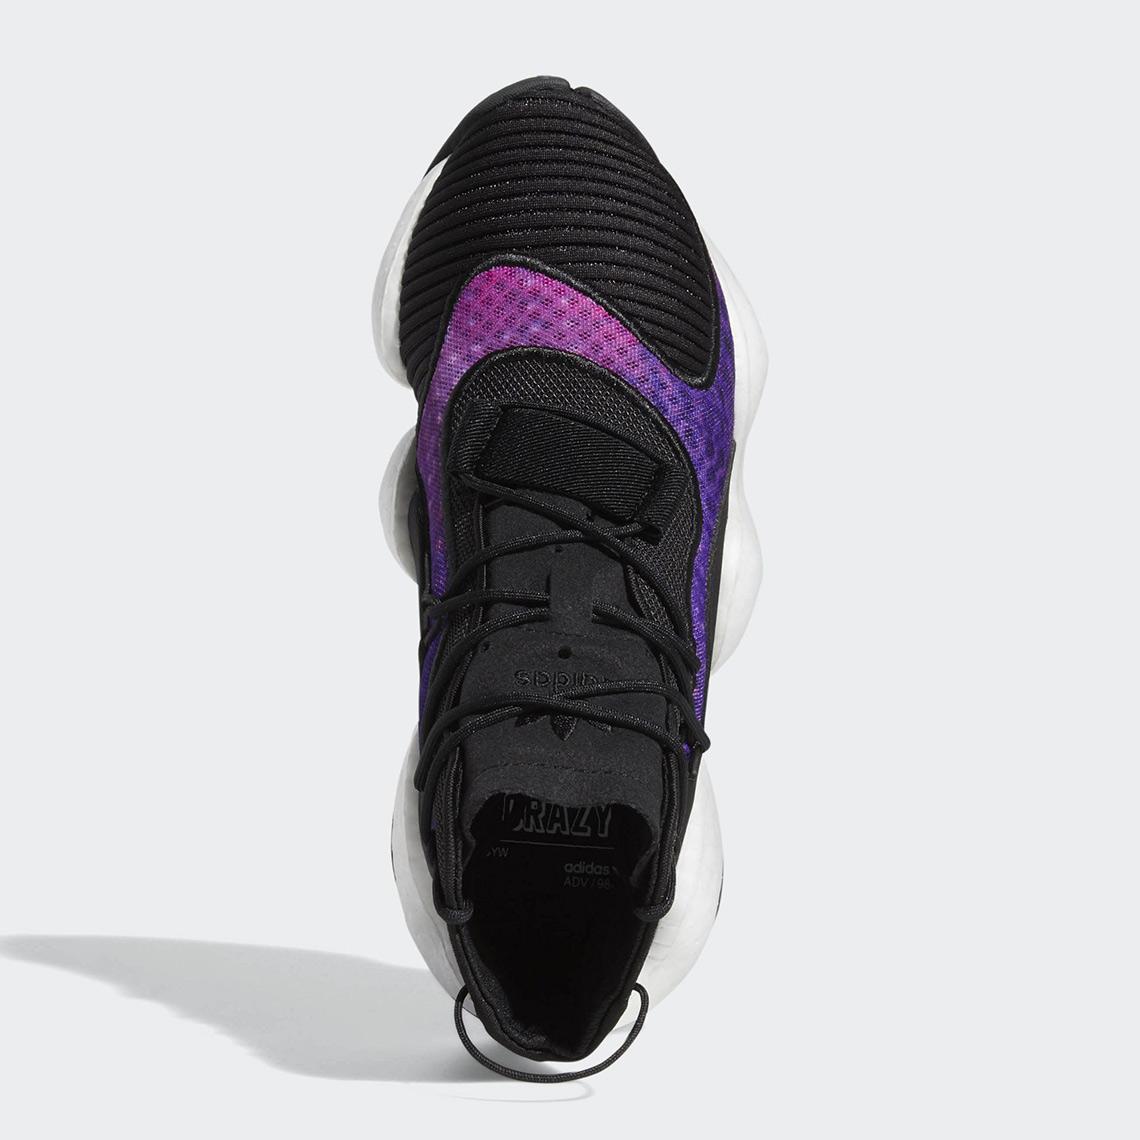 buy online 550df 1ac17 adidas Crazy BYW Snakeskin CG6780 Release Info  SneakerNews.